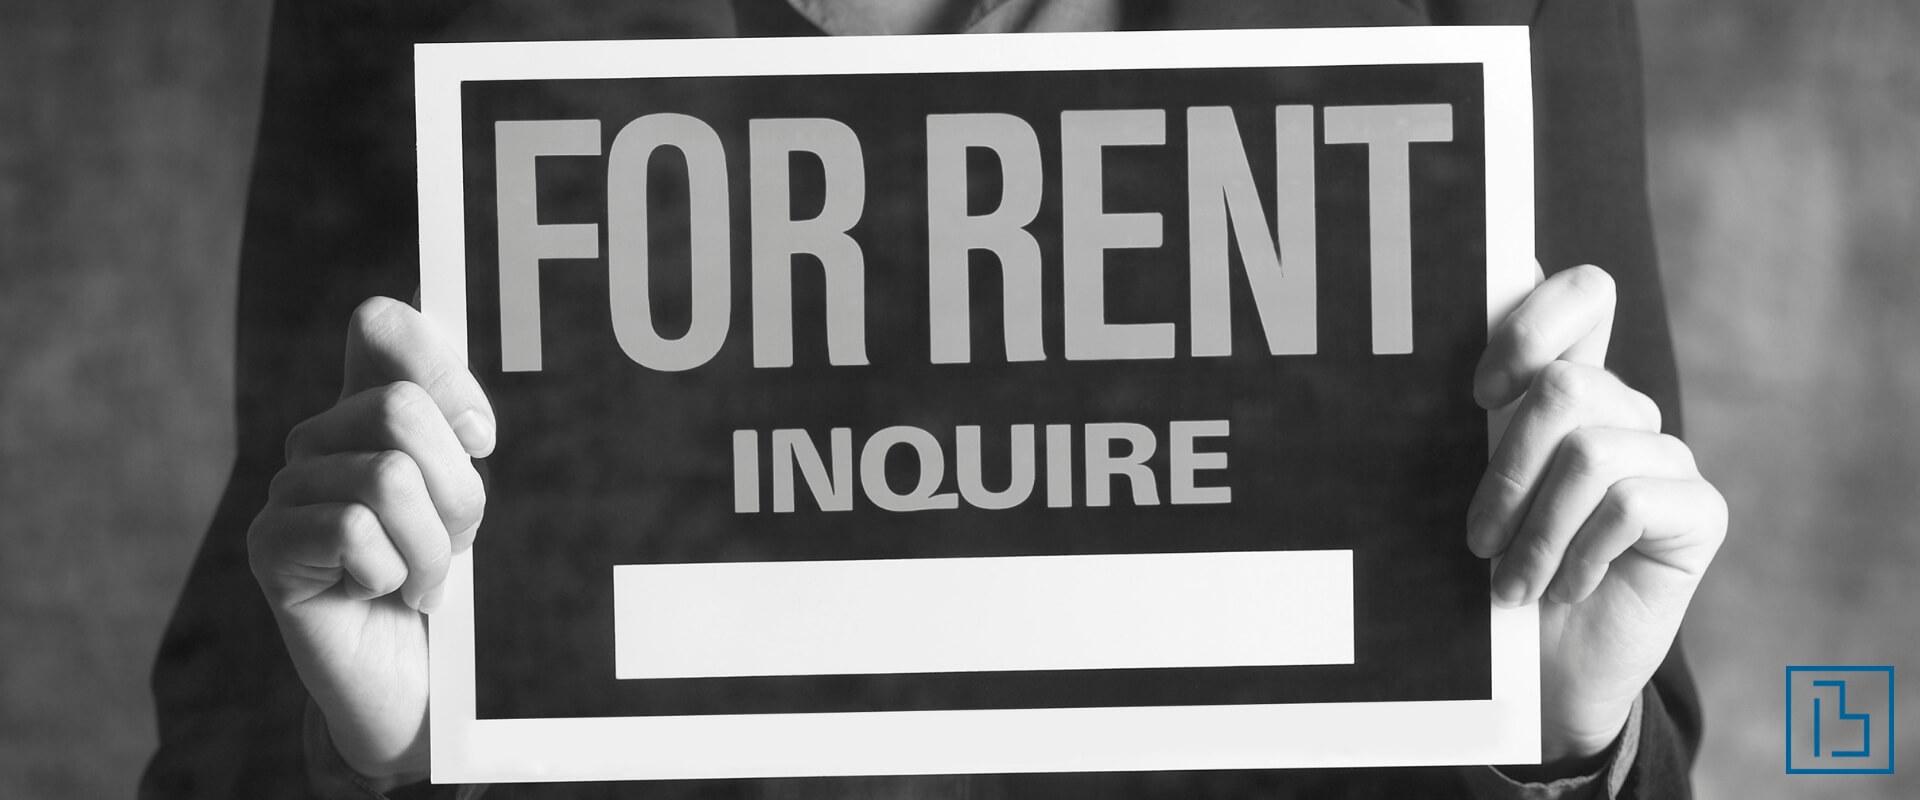 For Rent Sign Seattle - Beachworks LLC